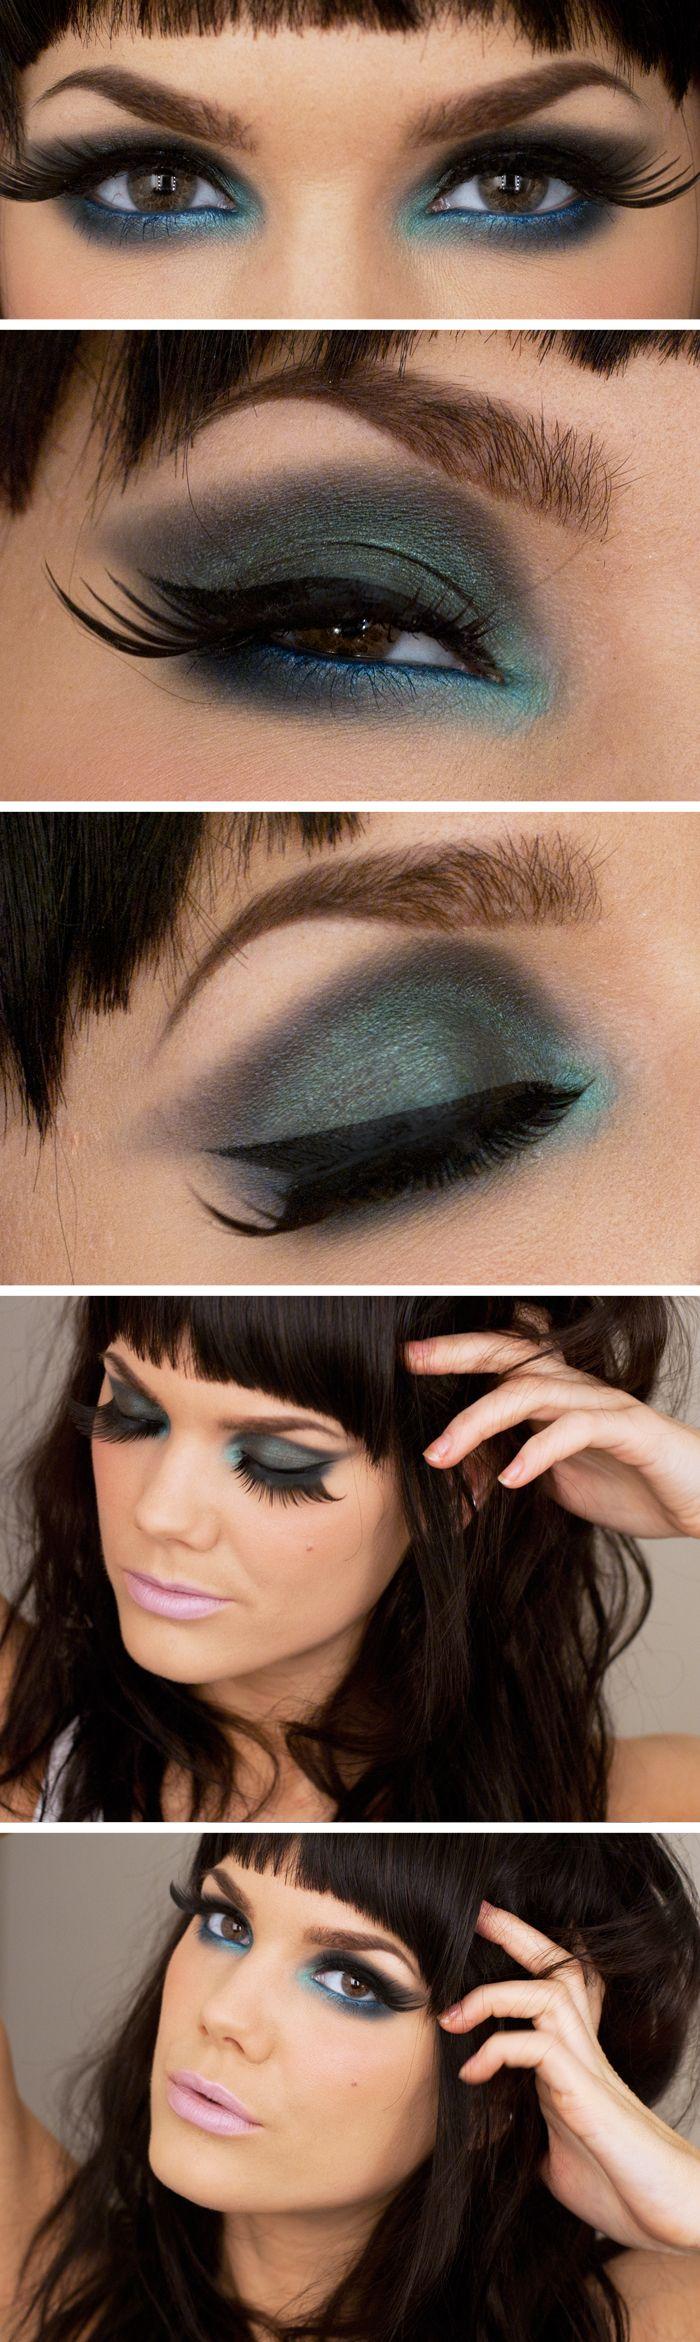 Todays look – Menace, Linda Hallberg - makeup artist